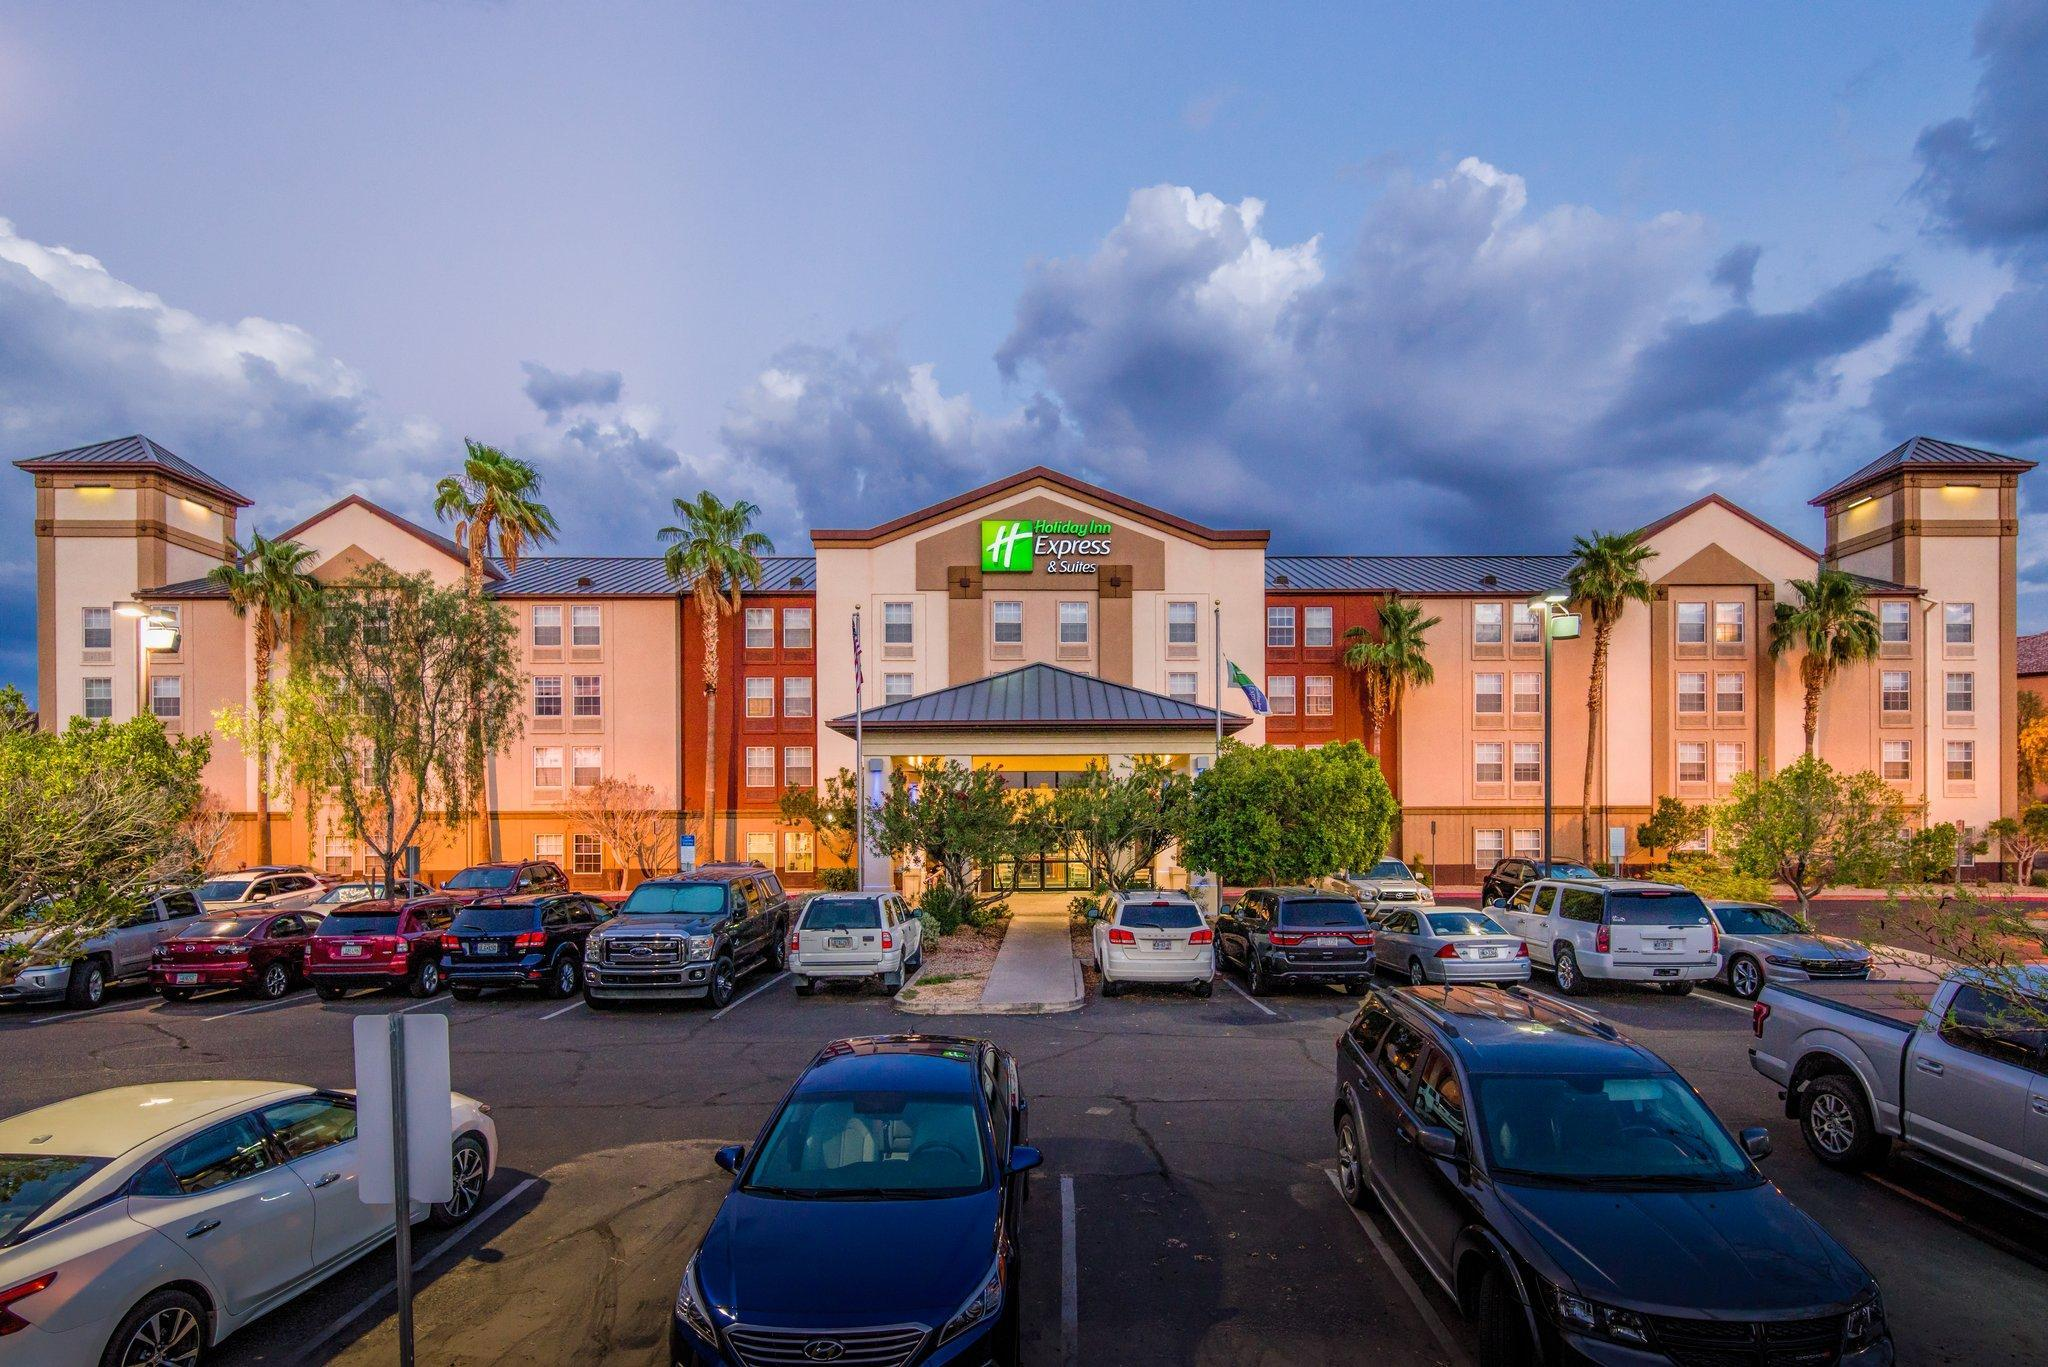 Holiday Inn Express Phoenix-Airport/University Drive image